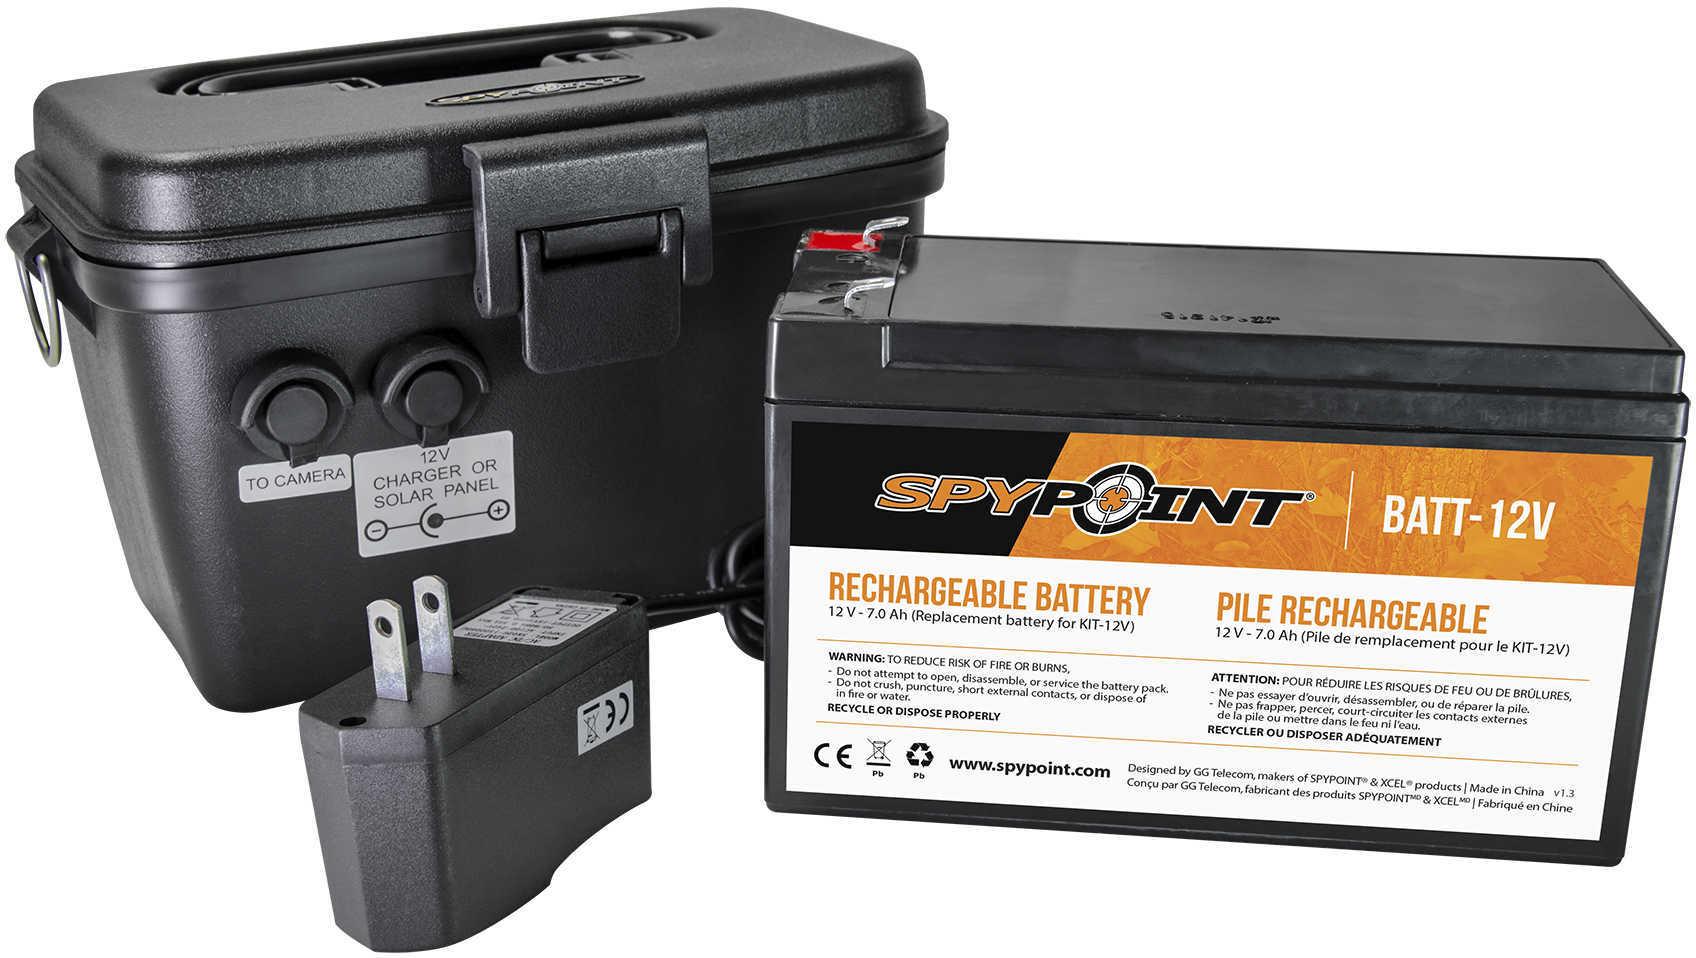 Spypoint KIT12V Rechargeable Battery Charger and Housing Kit 12V 12V Power Pack 1